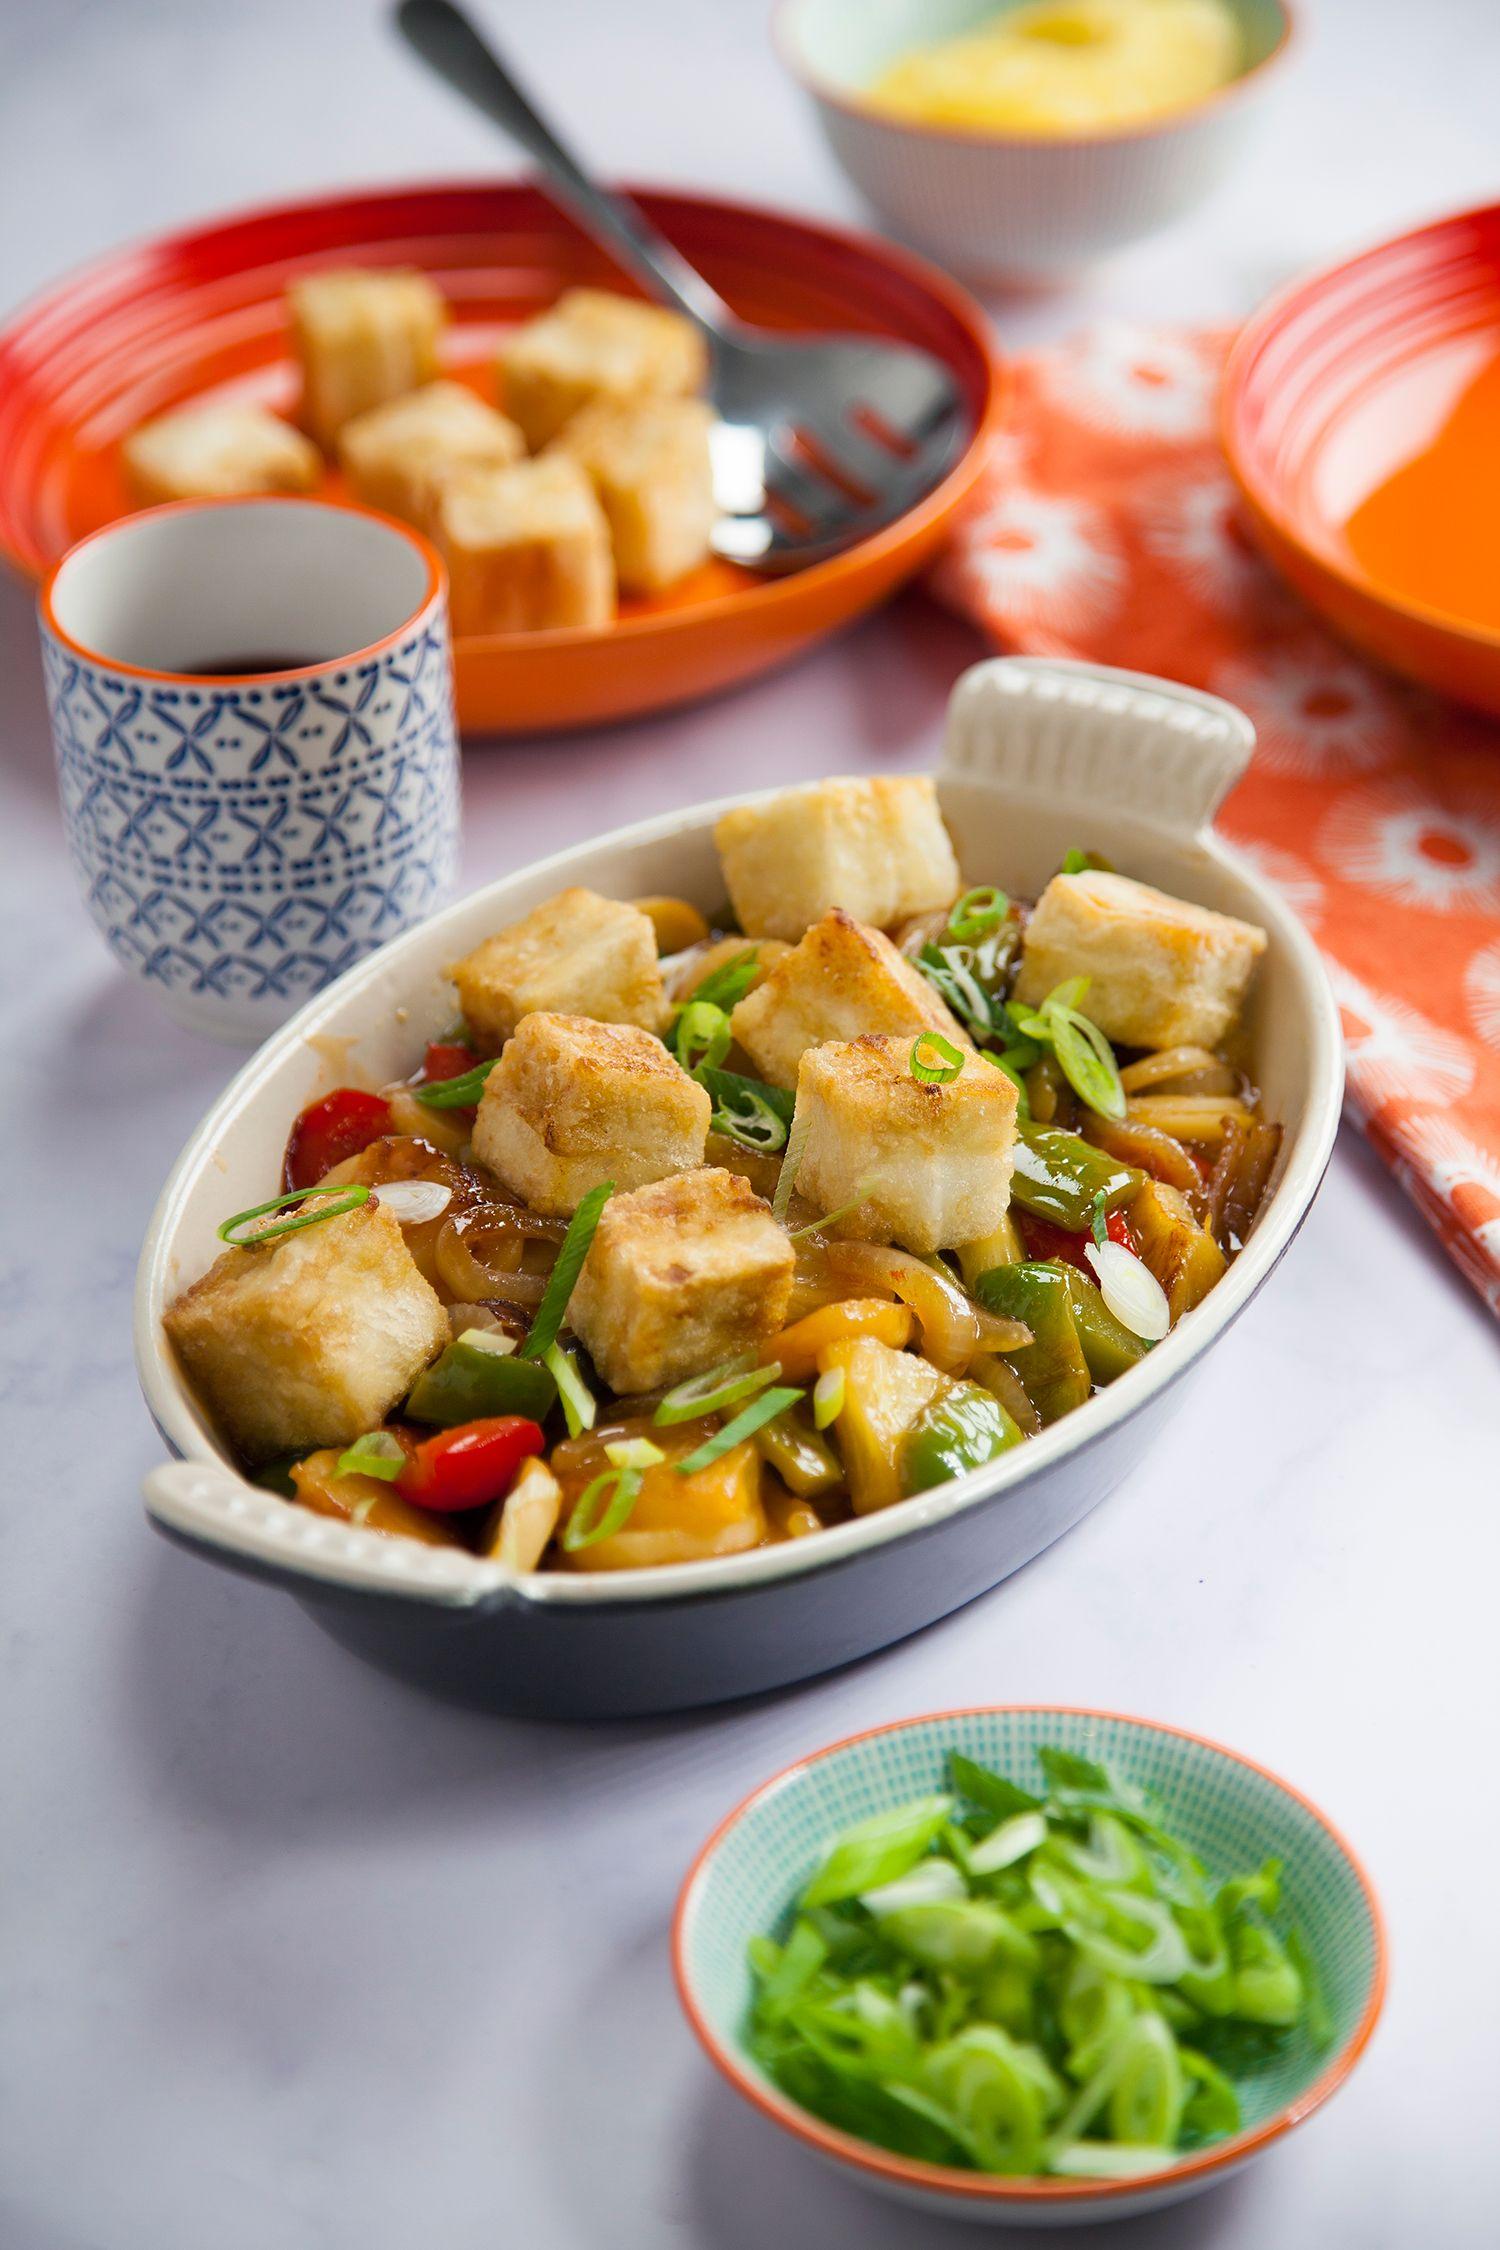 vegan sweet and sour tofu